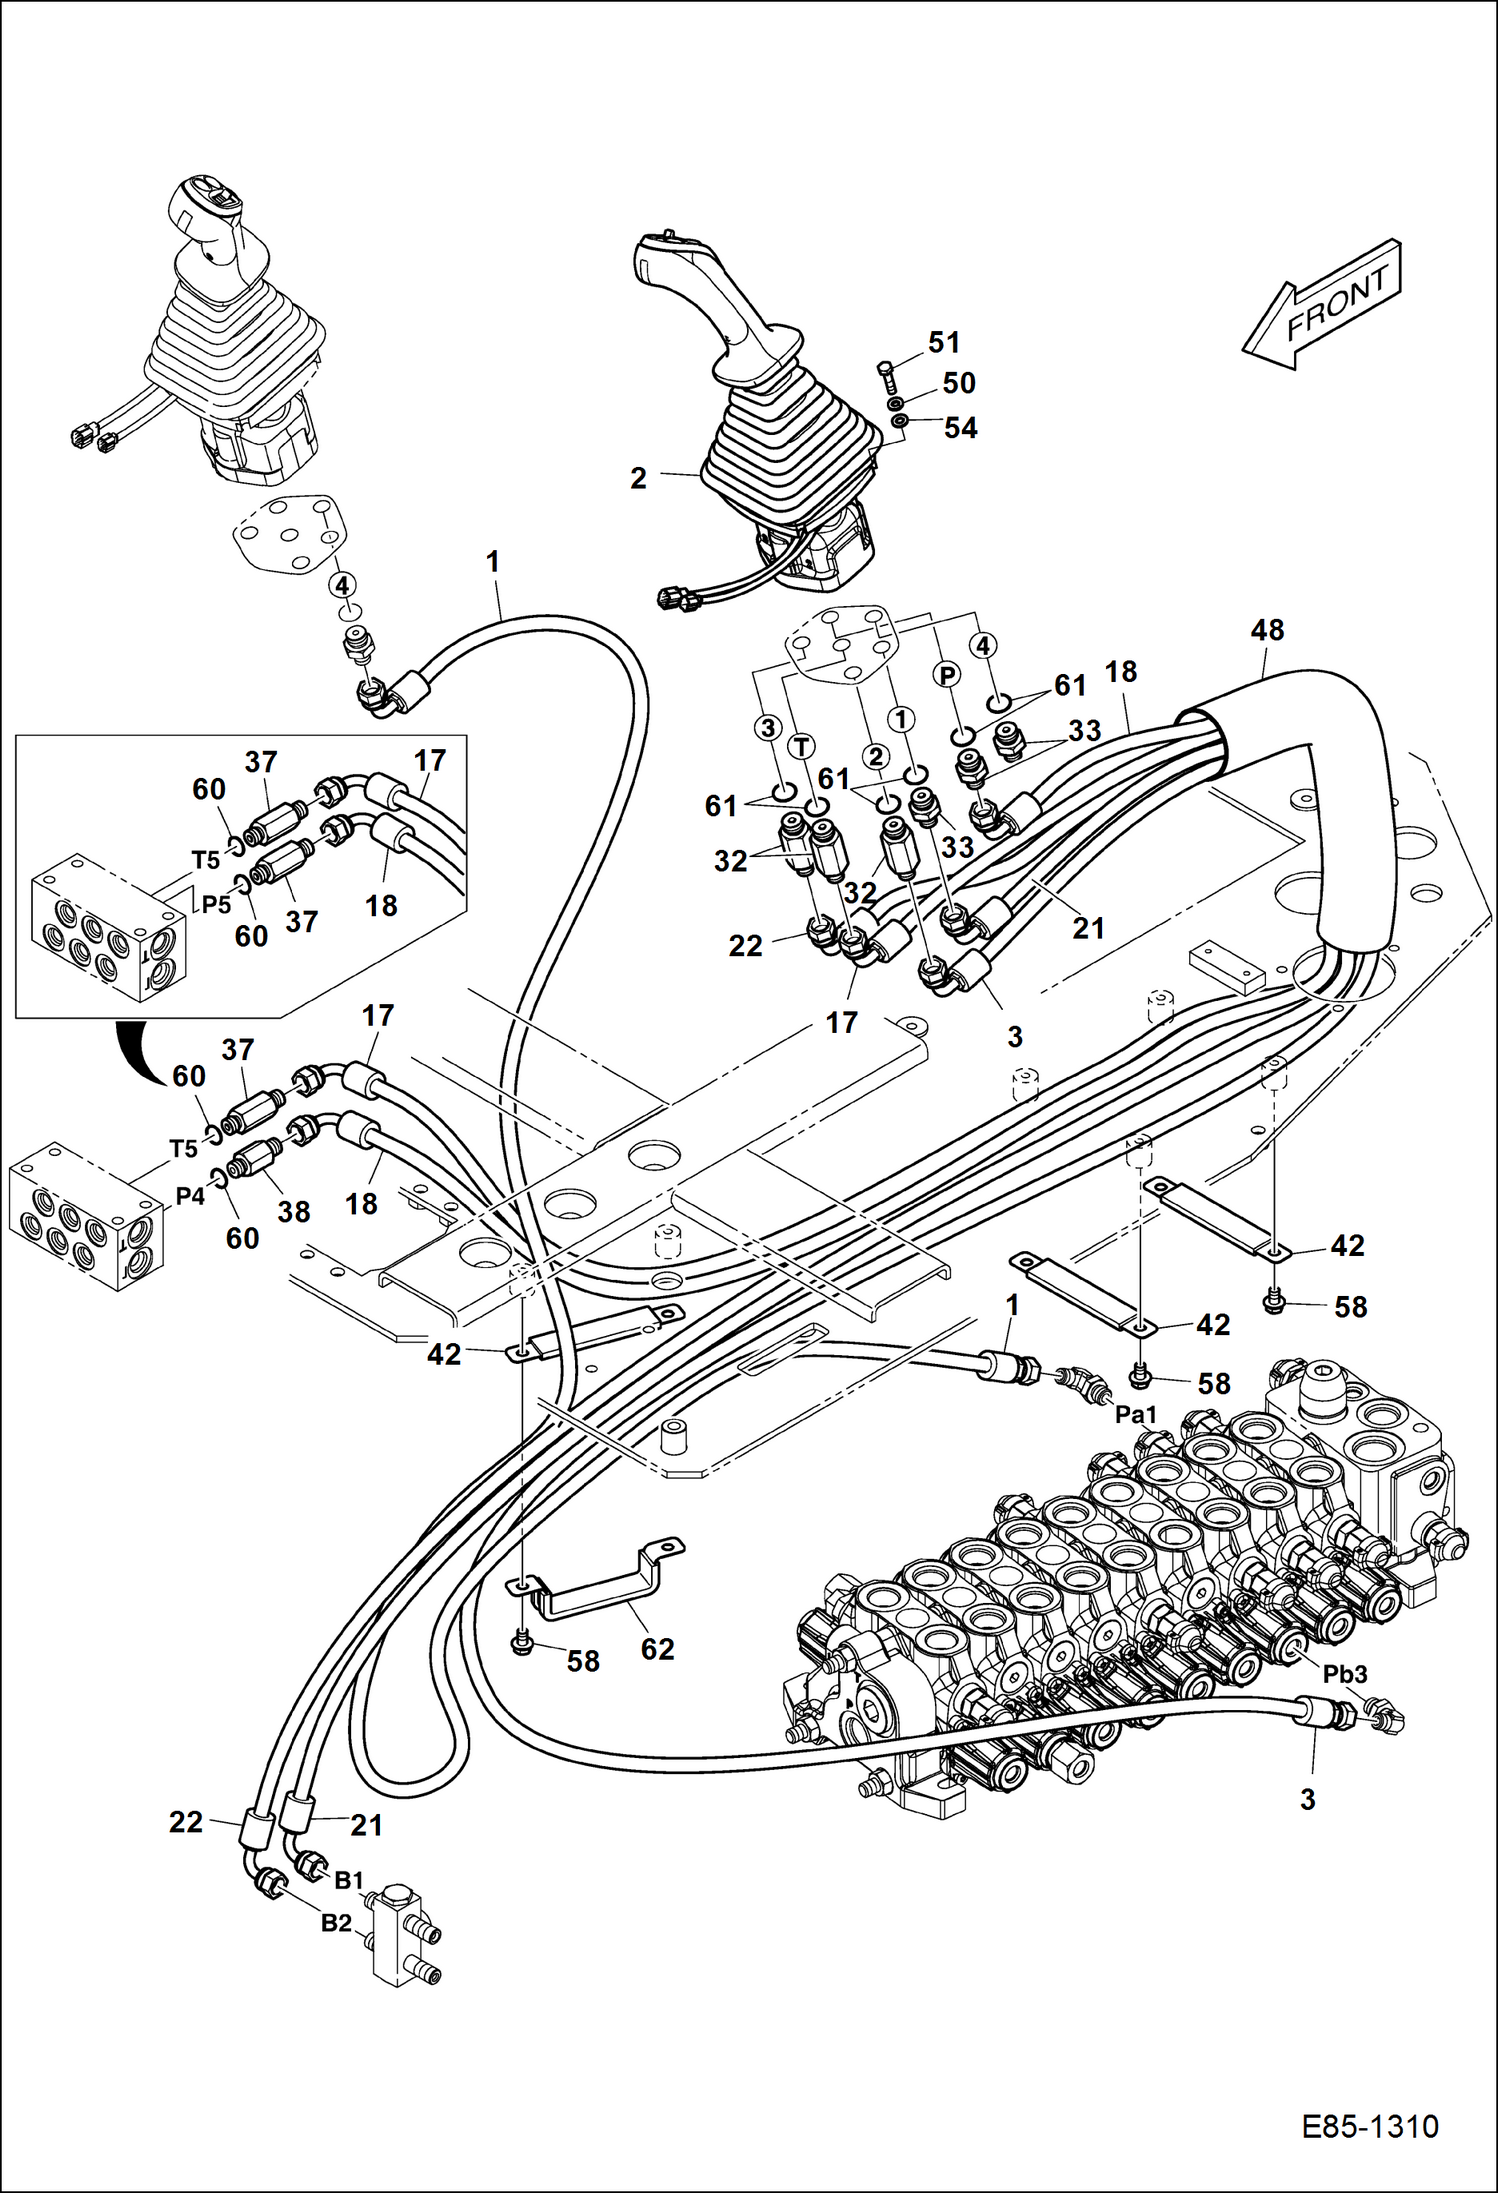 Bobcat 743 Hydraulic Hose Diagram